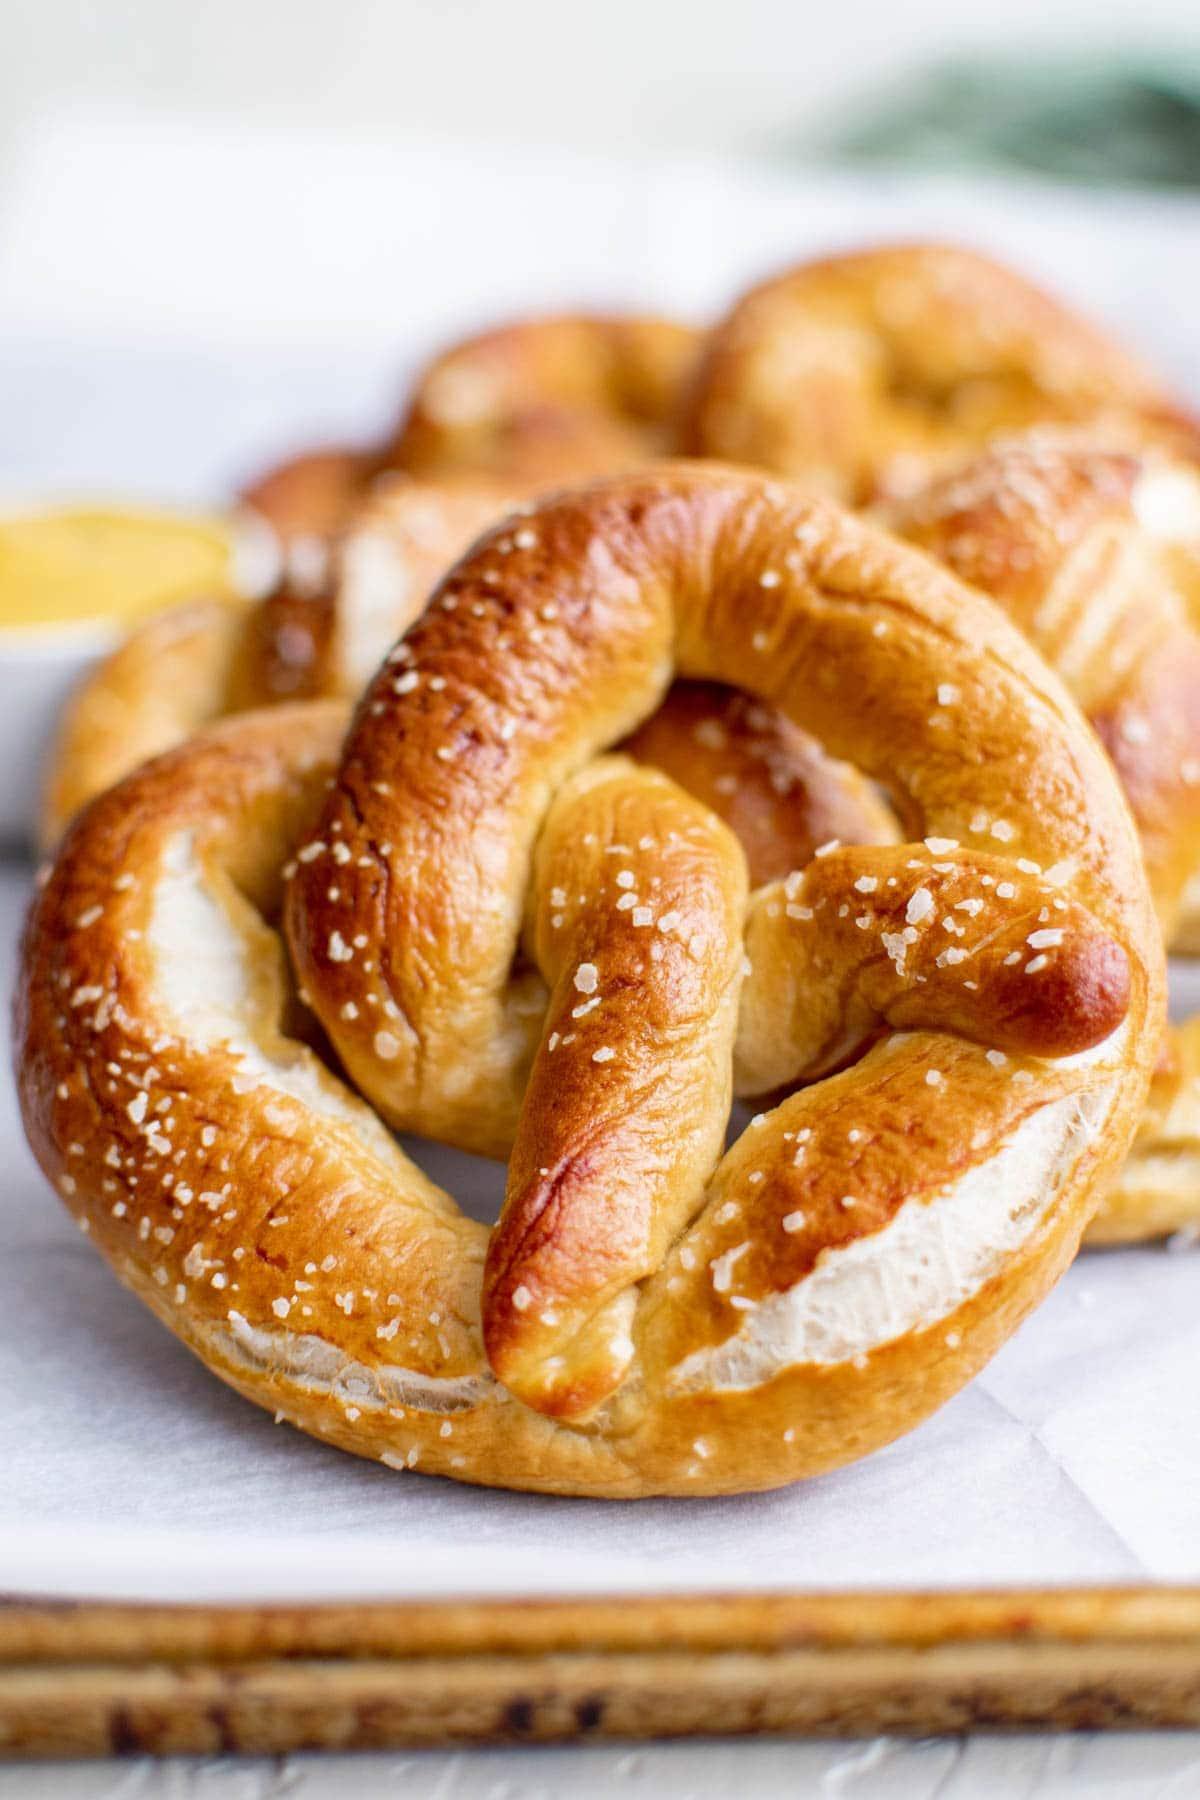 soft pretzels baked with salt, wood cutting board, parchment paper